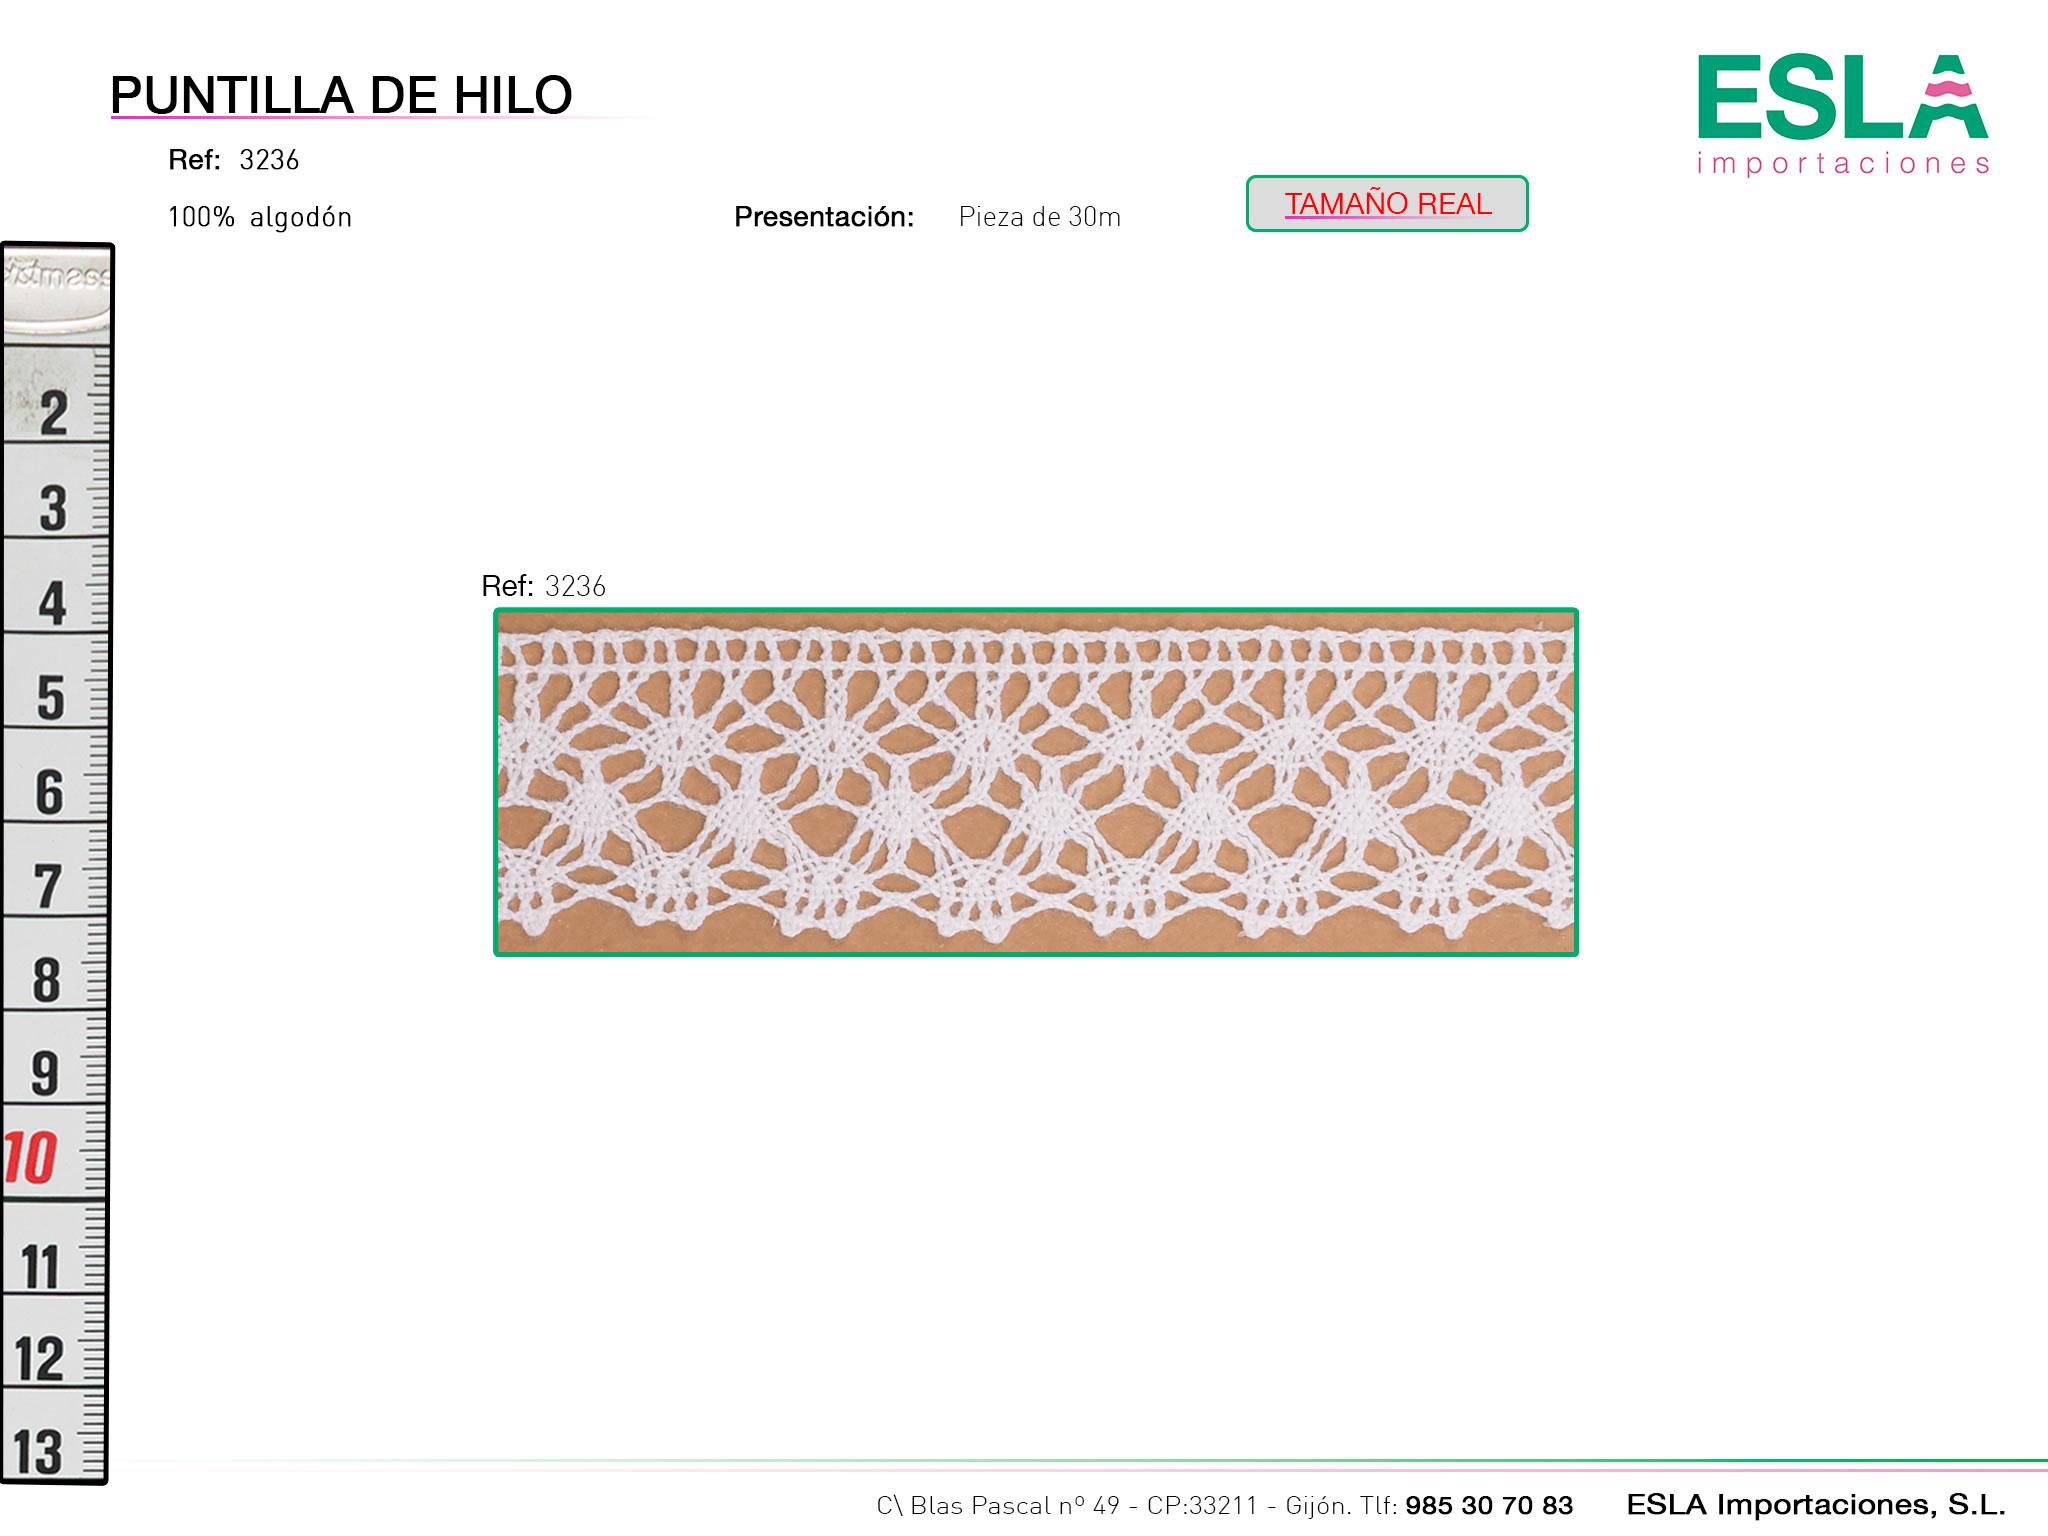 Puntilla de hilo, Familia 3236, Ref 3236